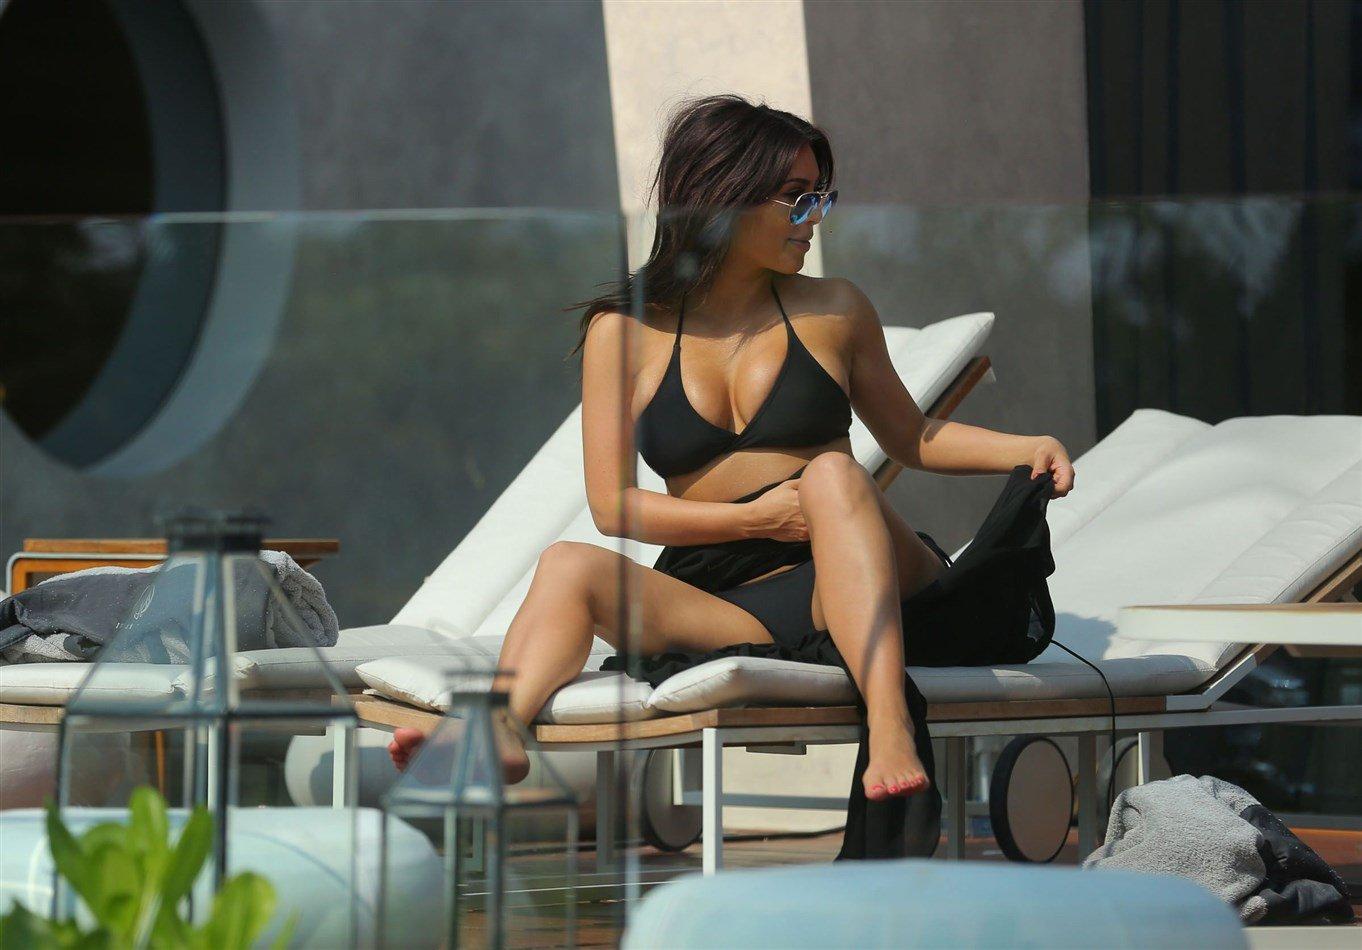 Kim Kardashian In An Ill-Fitting Black Bikini